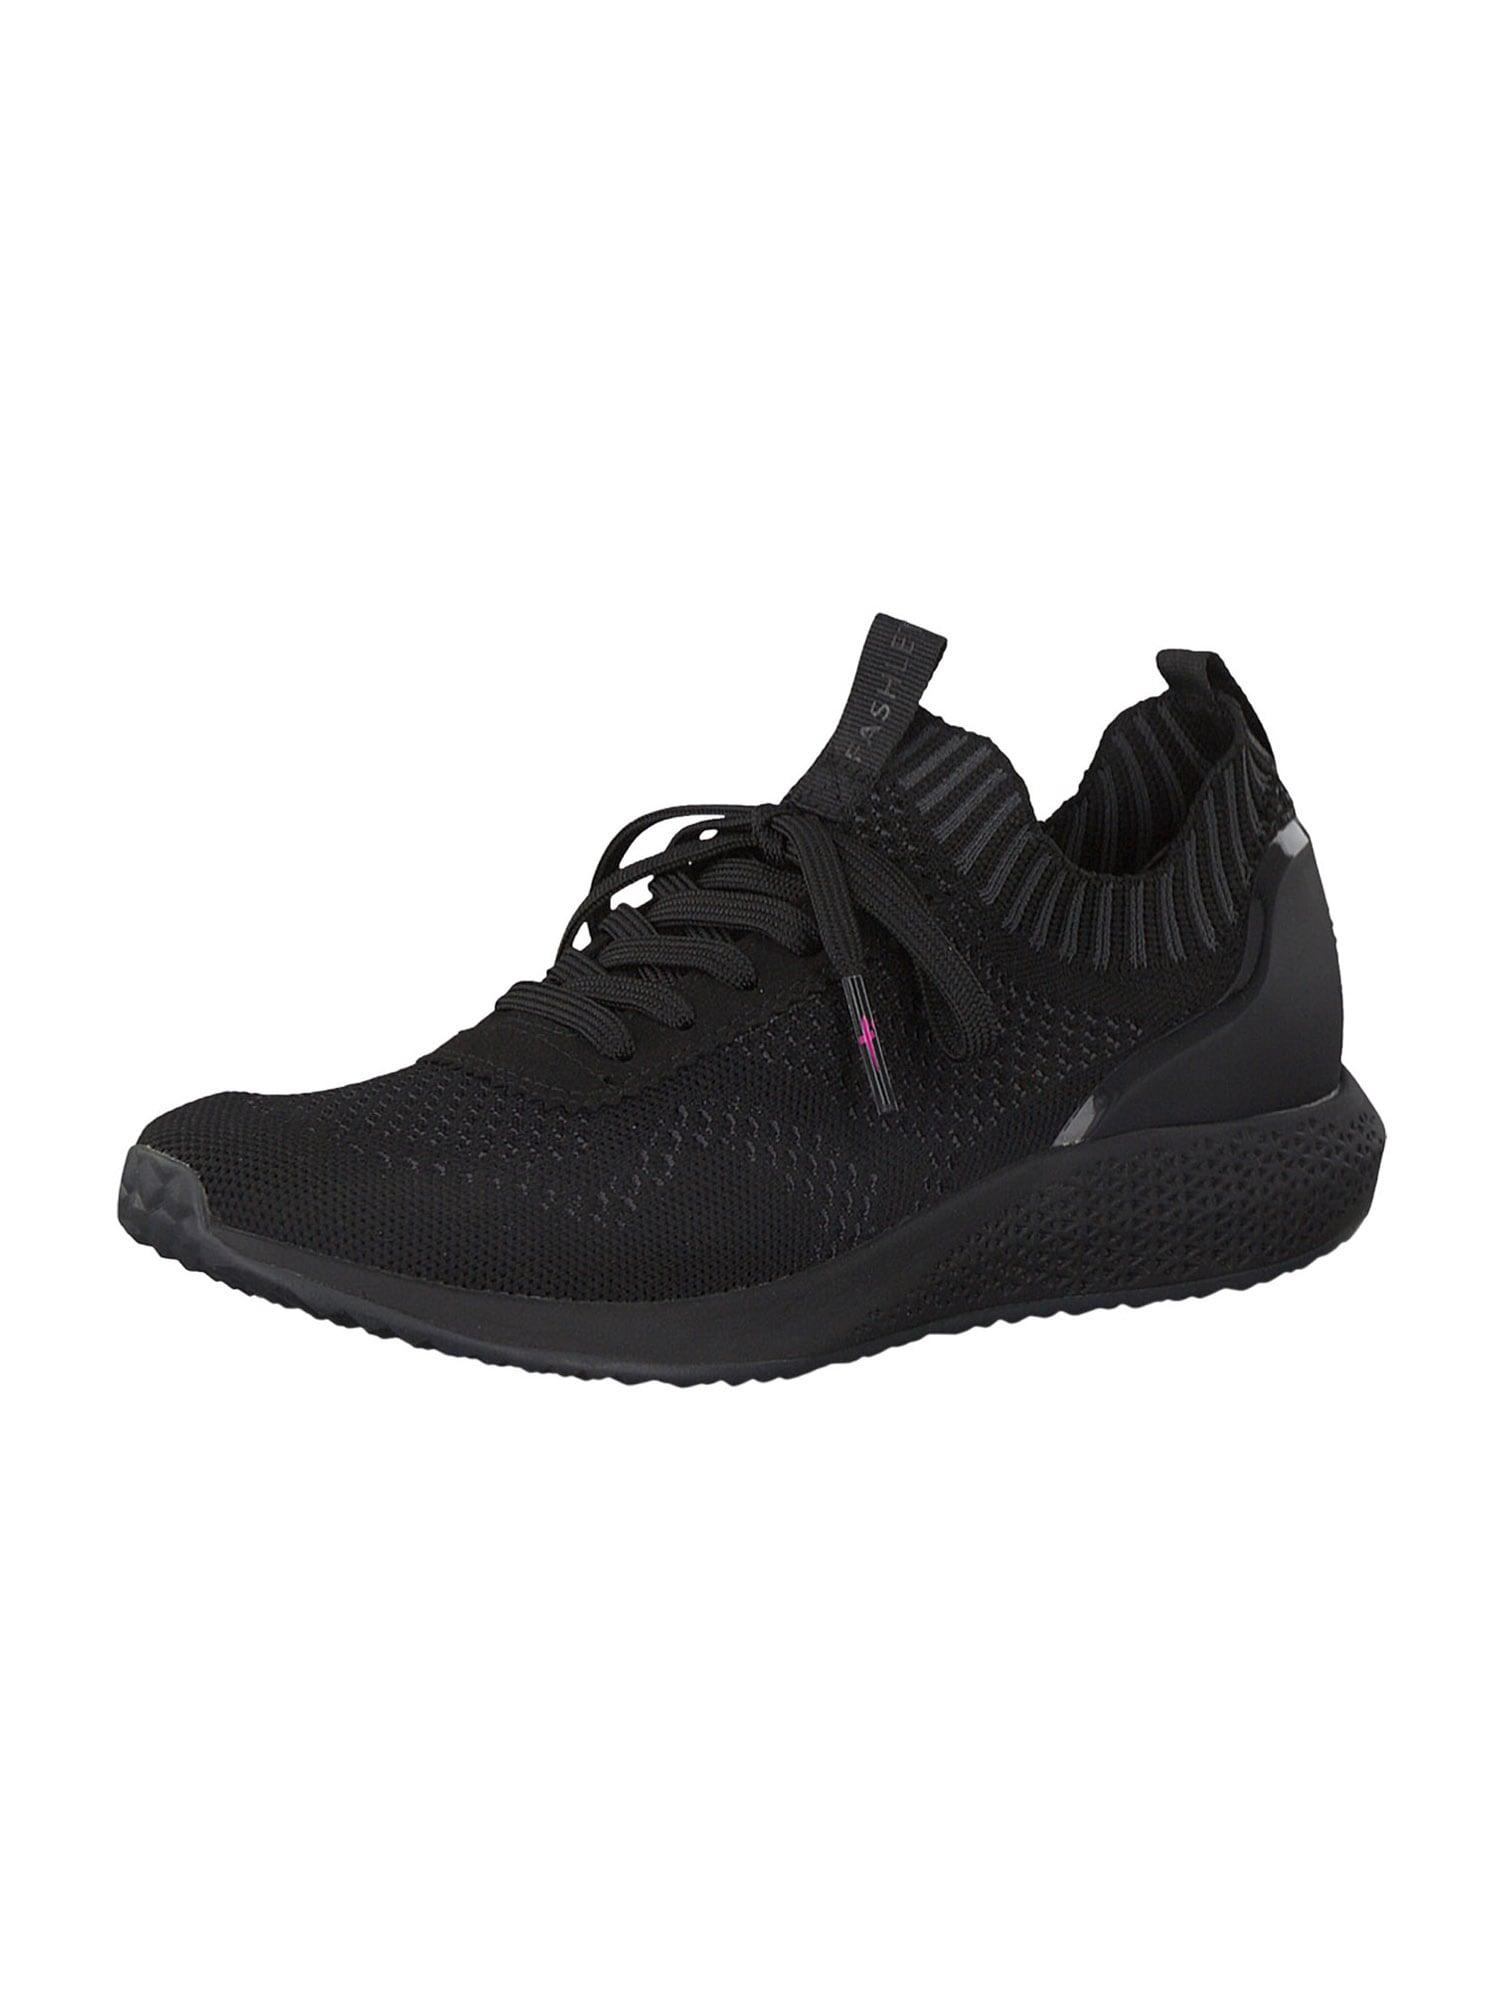 Tamaris Fashletics Sneaker tamsiai pilka